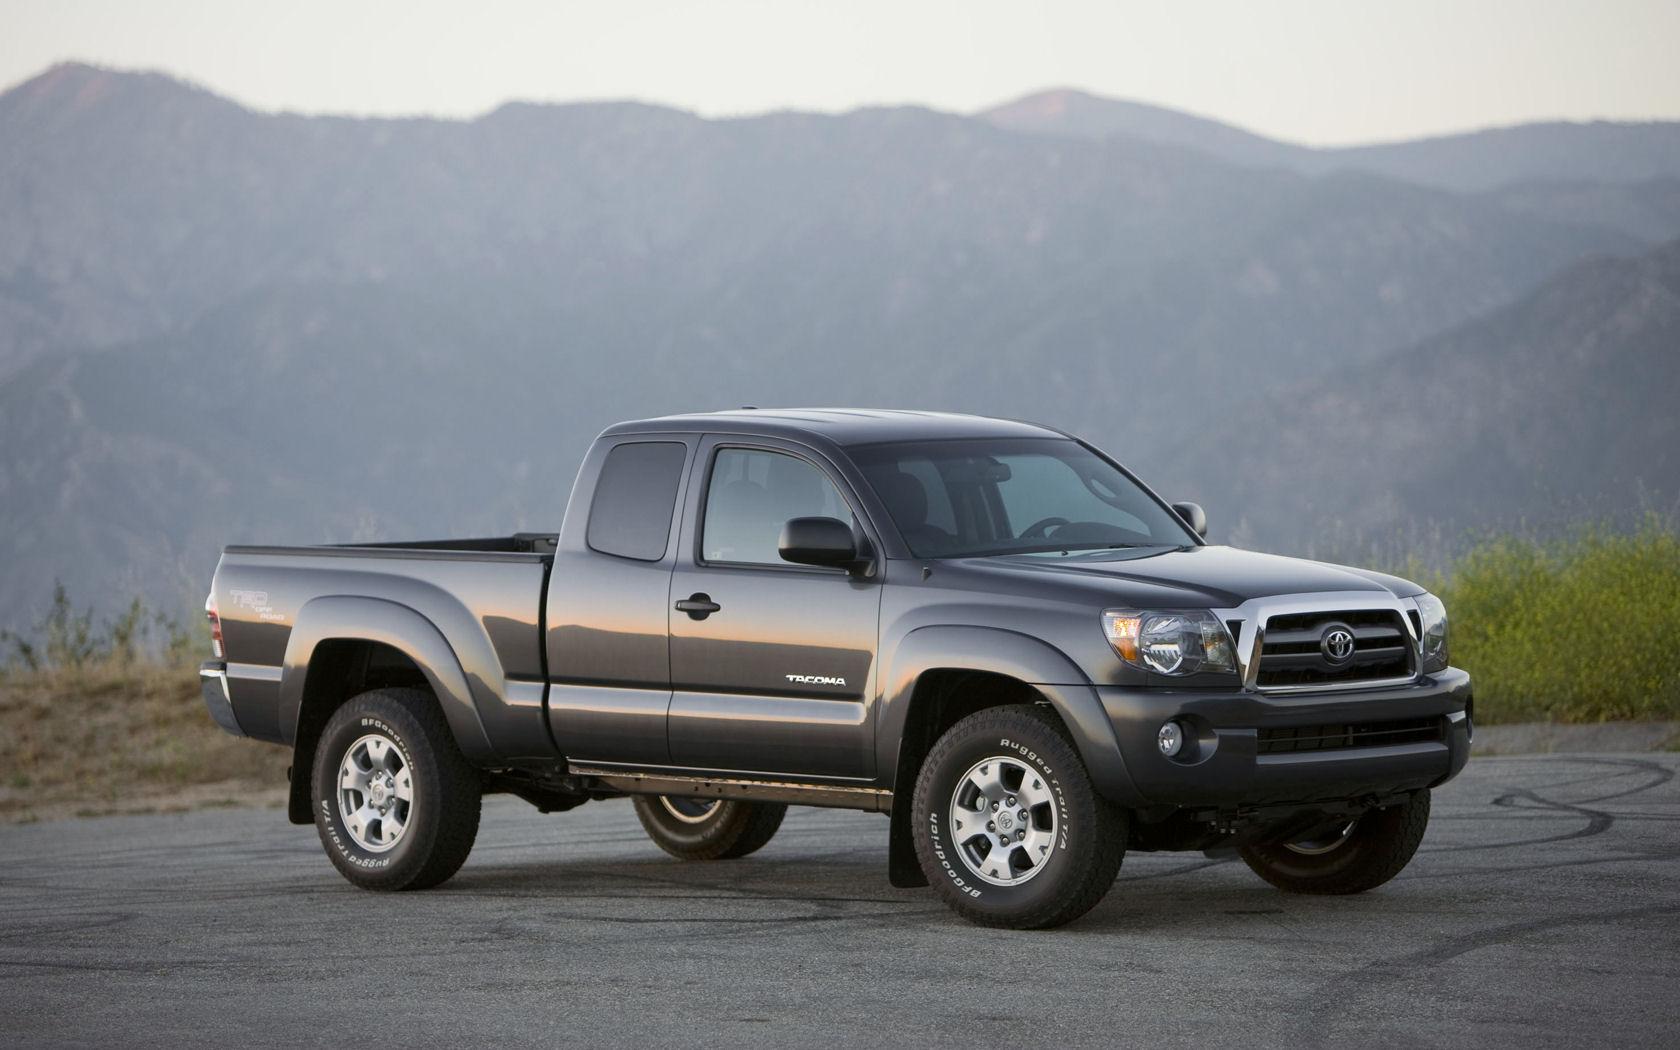 2010 Toyota Tacoma Recall 1680x1050